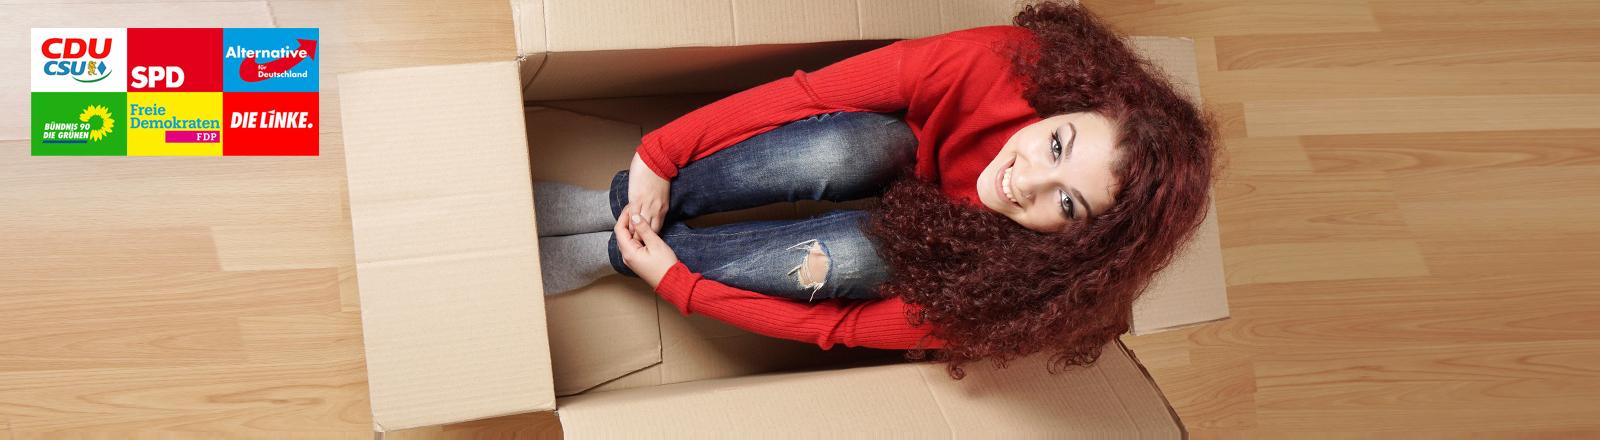 Junge Frau sitzt im Umzugskarton